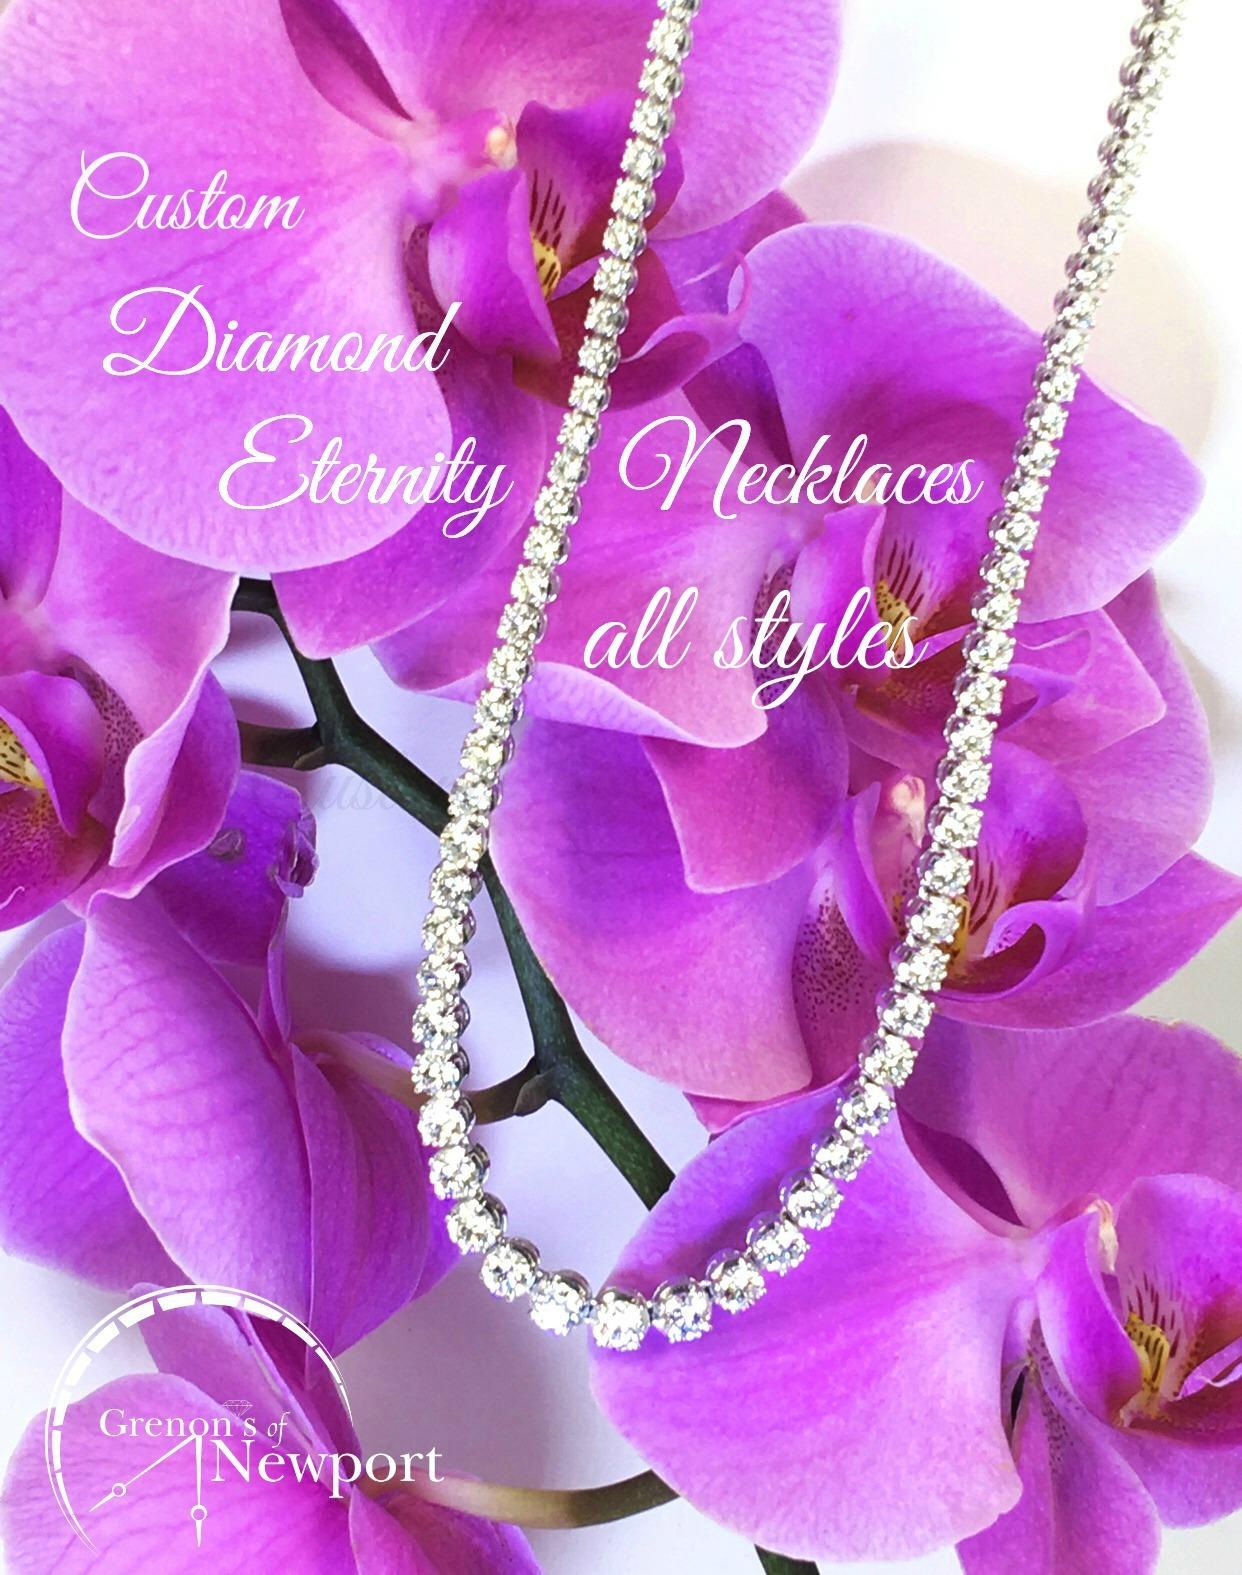 Grenons_Of_Newport_Custom_design_Diamond_Eternity_Necklaces_all_styles